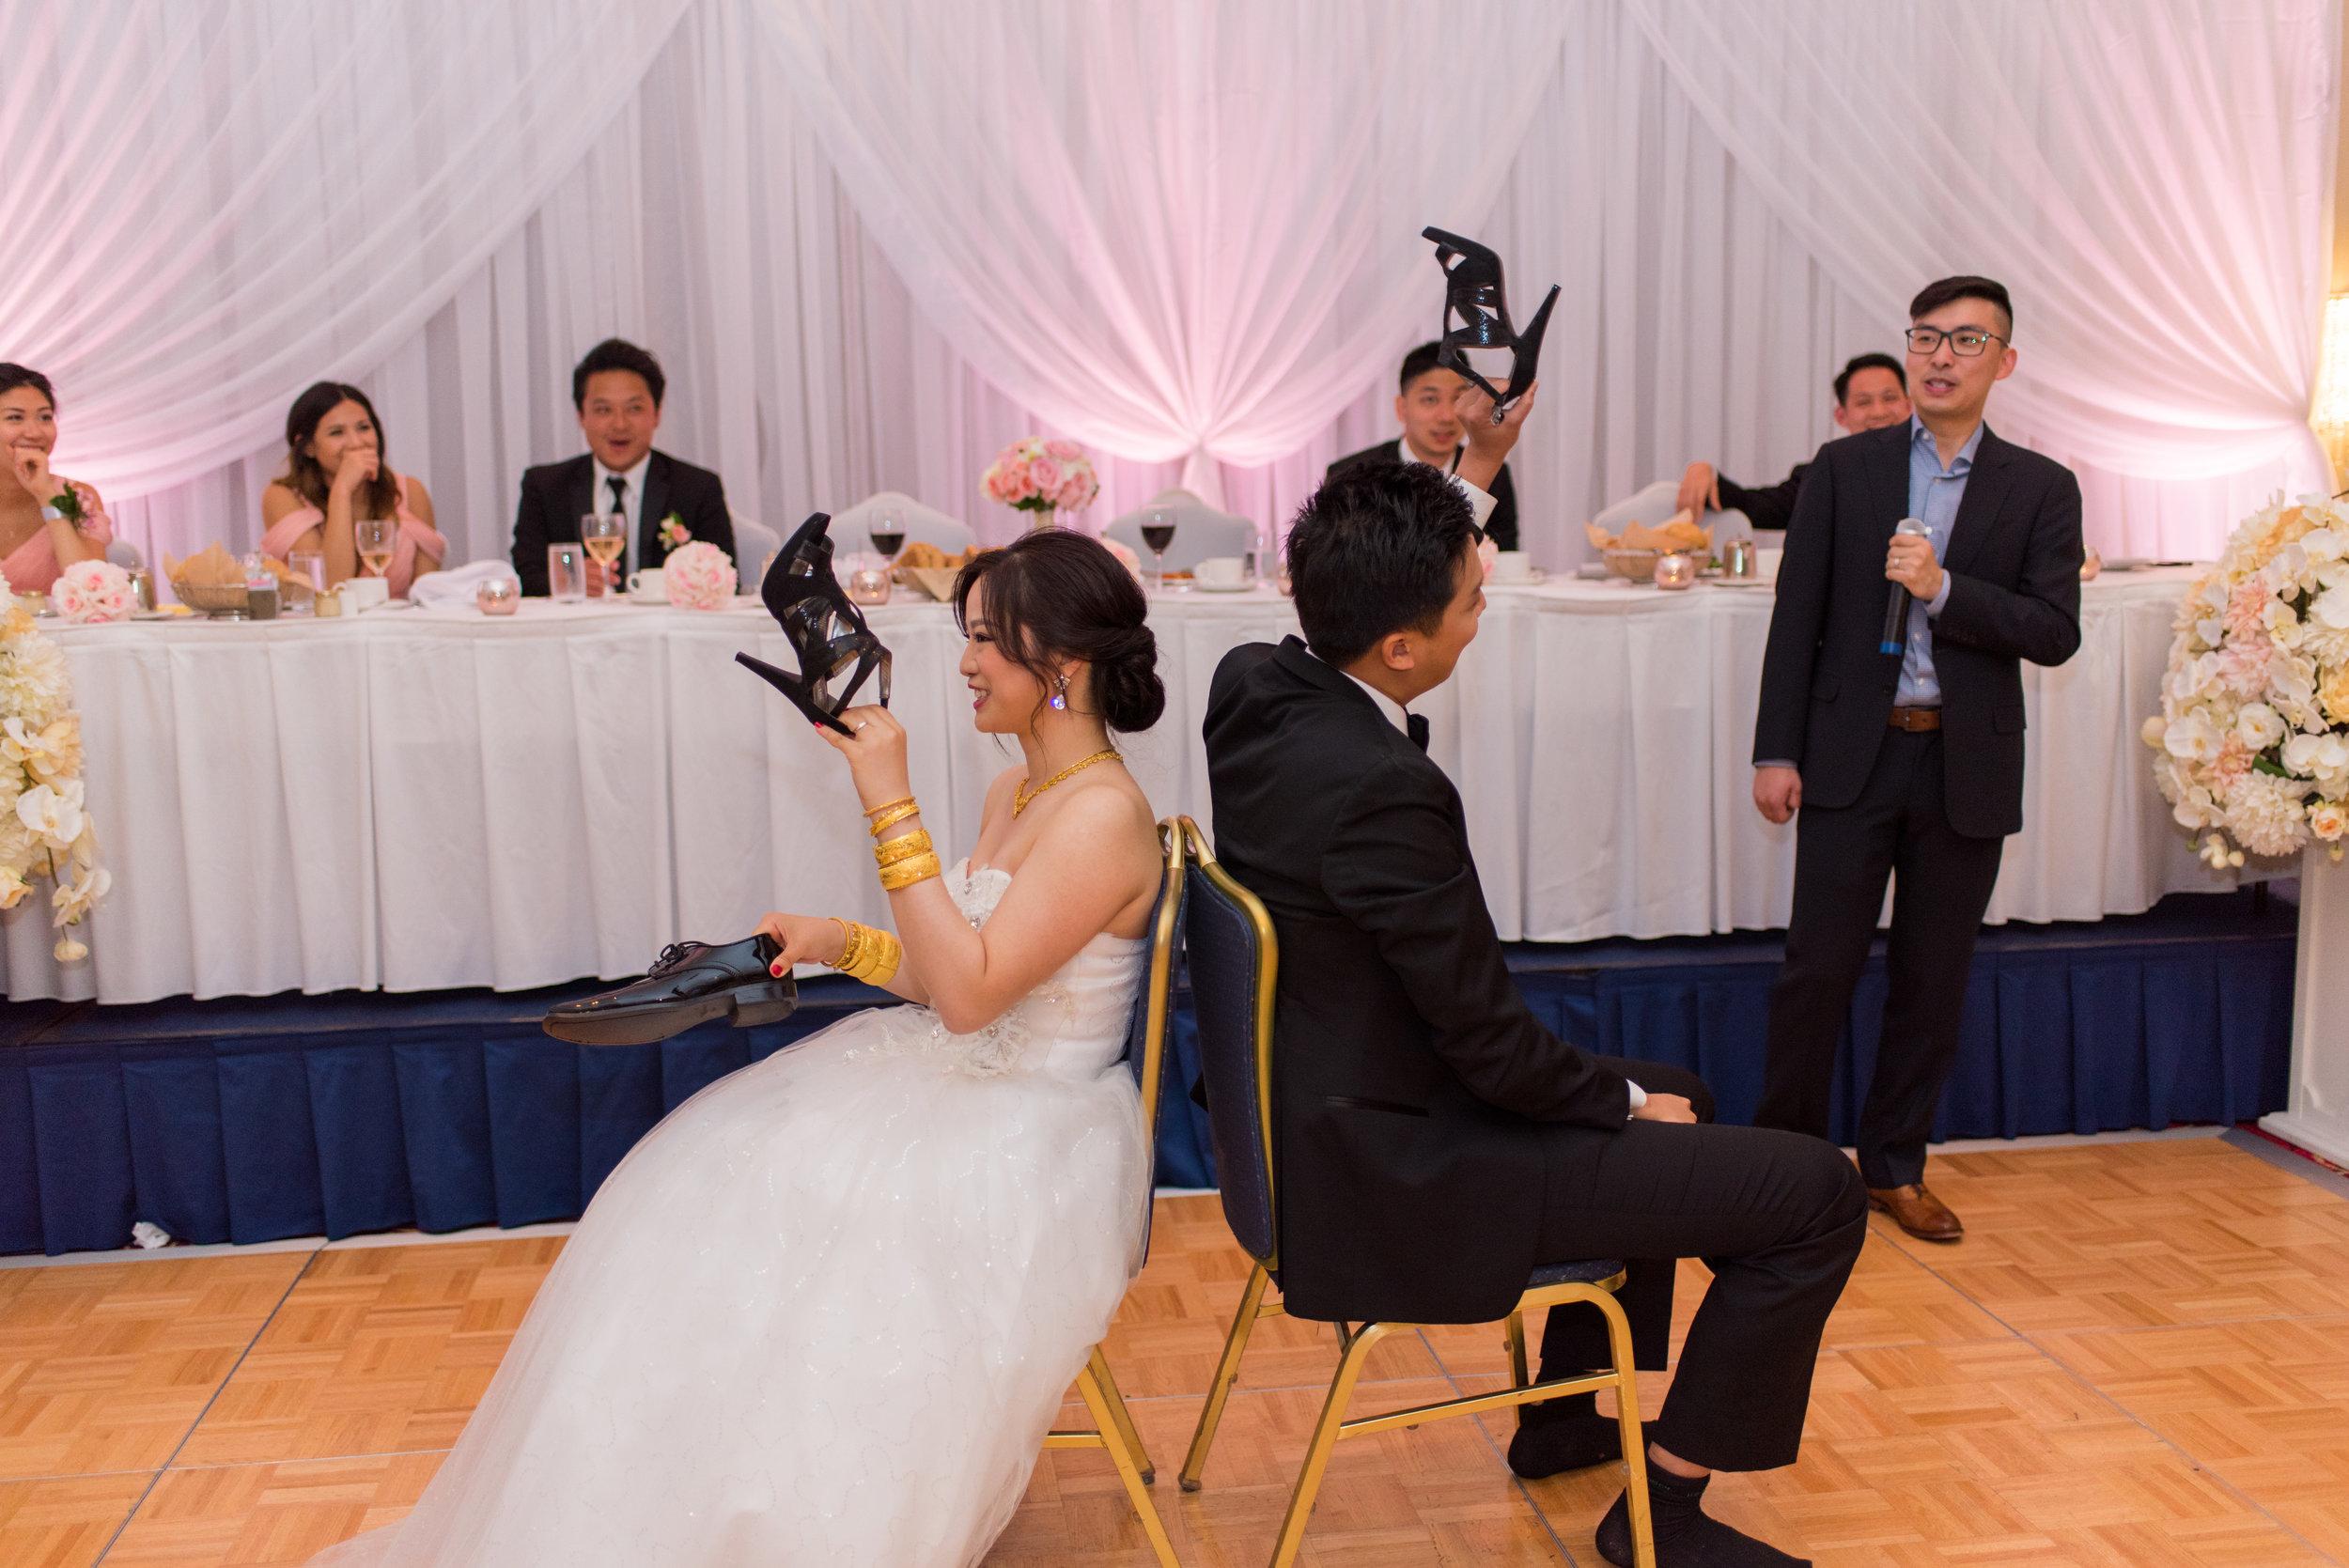 Yessica and Sam s Wedding-05 Reception-0227.jpg